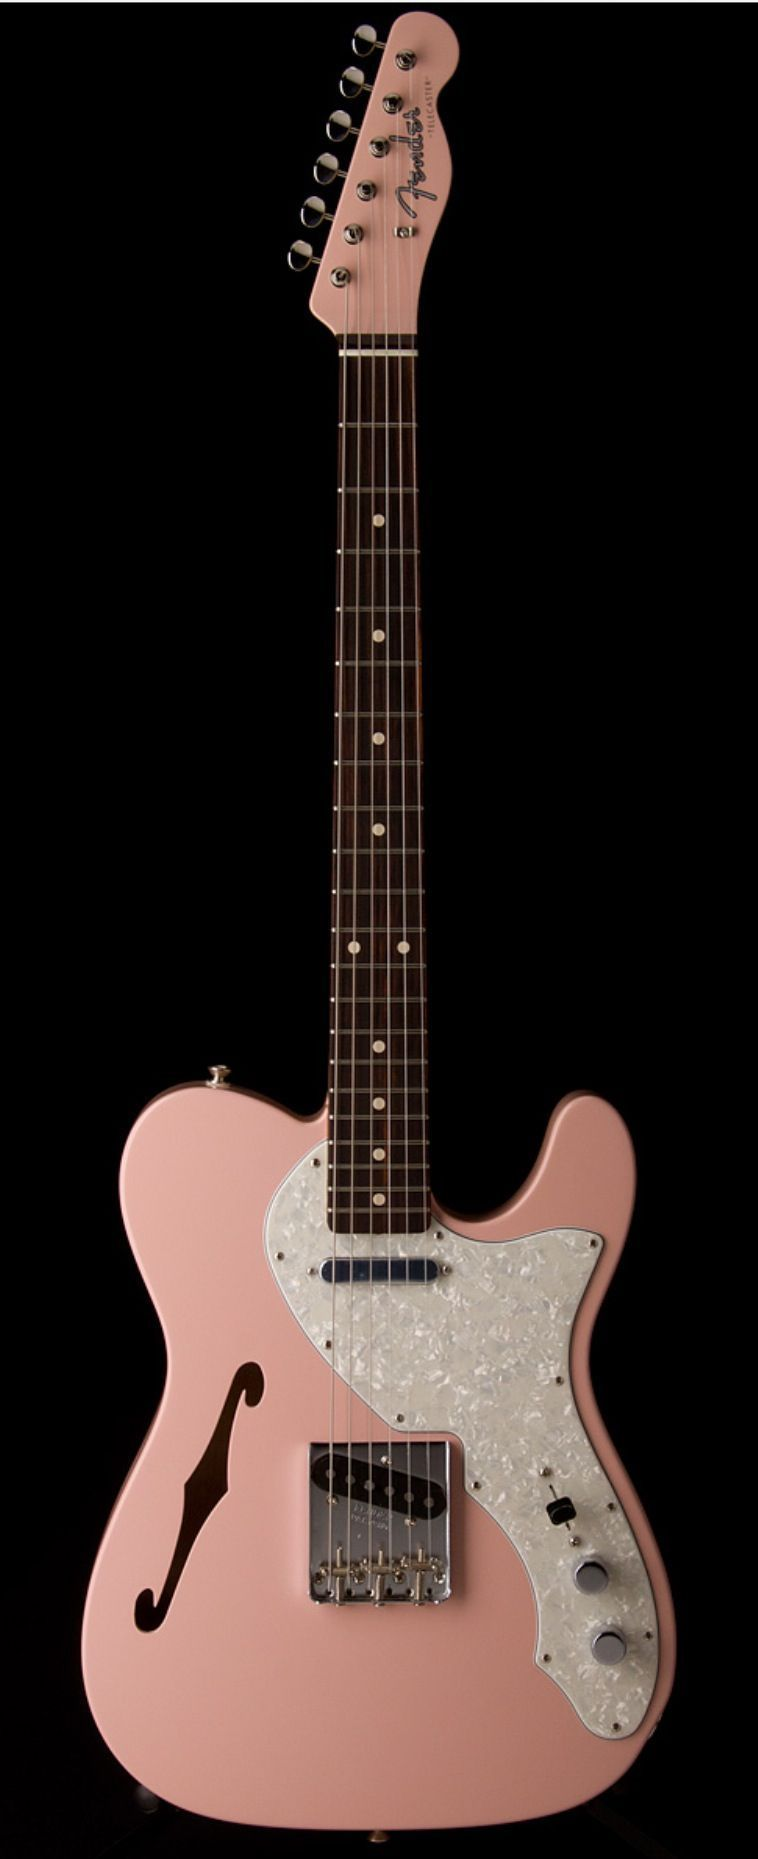 fender master built 1960 thinline telecaster shell pink by yuriy shishkov guitar center. Black Bedroom Furniture Sets. Home Design Ideas